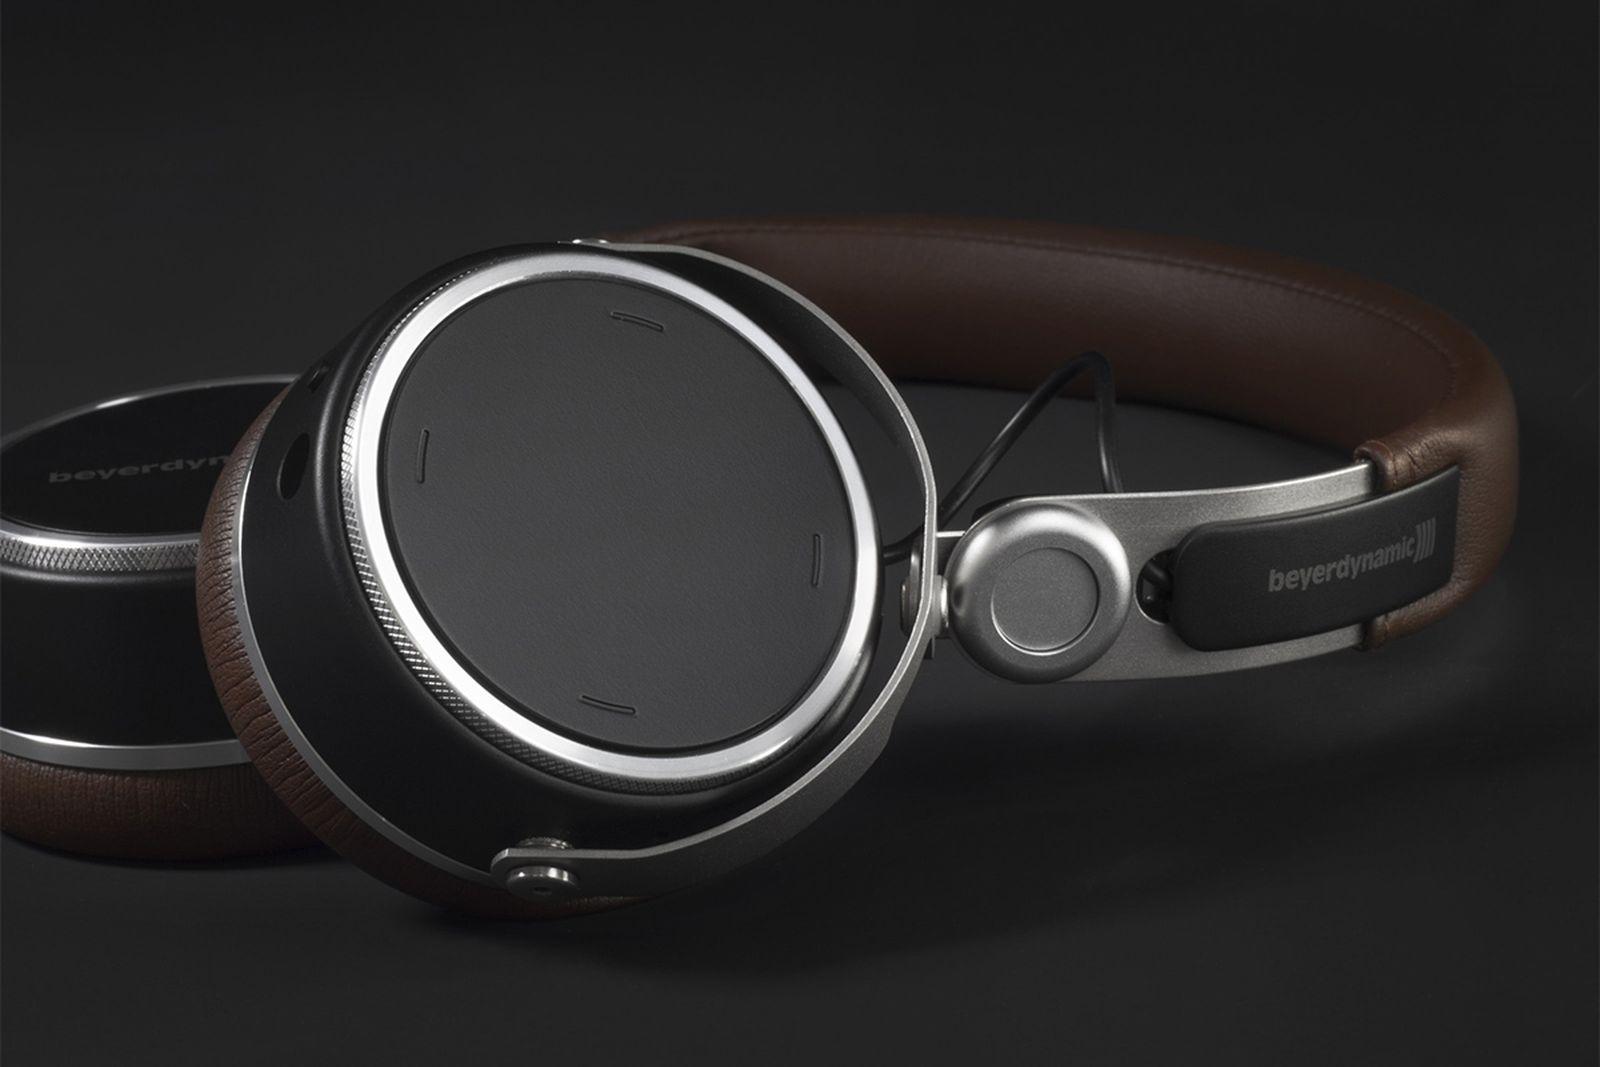 beyerdynamic xelentho wireless earphones headphones